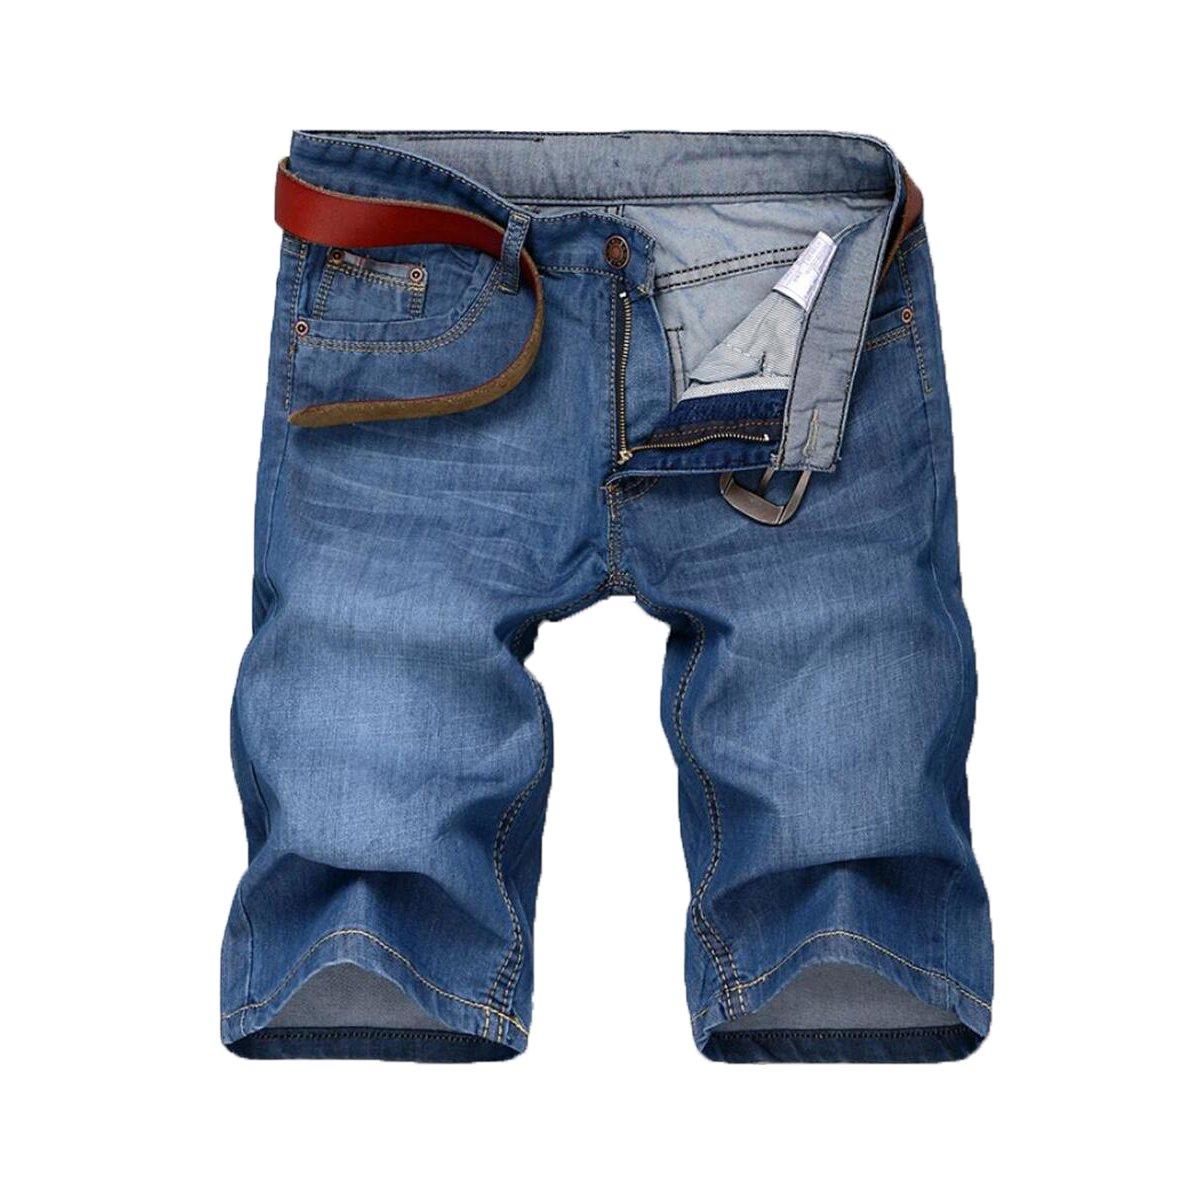 Futtle Men's Short Jeans Casual Light Weight Slim Fit Relax Regular Comfort Travel Denim Biker Half Pants (Light blue20, 33)